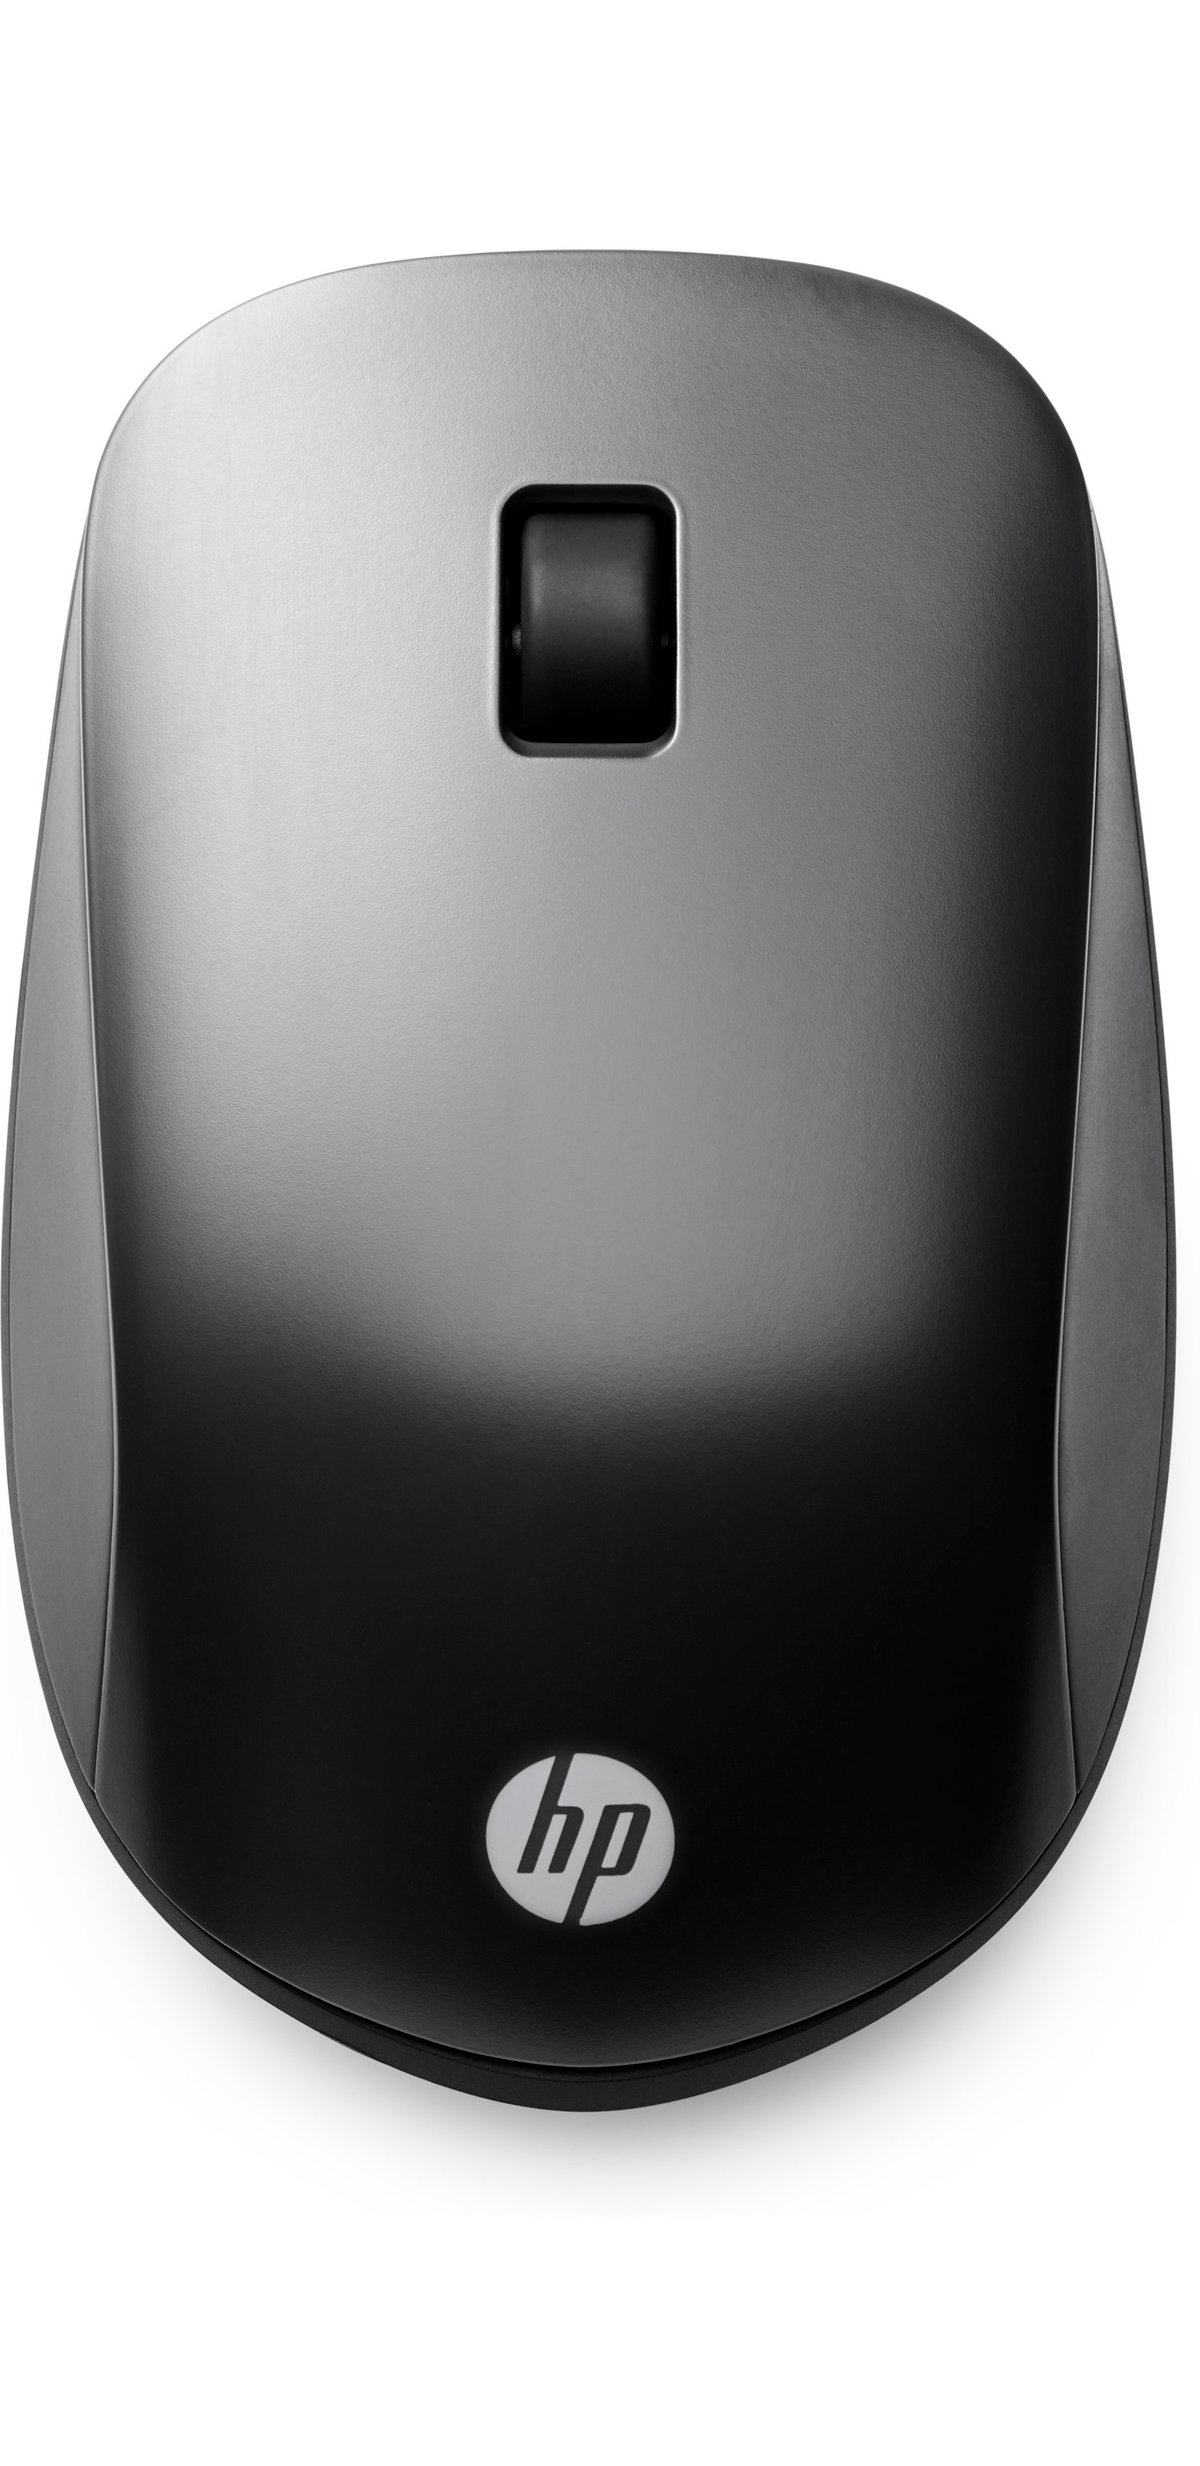 Product Hp Slim Mouse Bluetooth Logitech Usb B100 Original Slide 1 Of 4show Larger Image